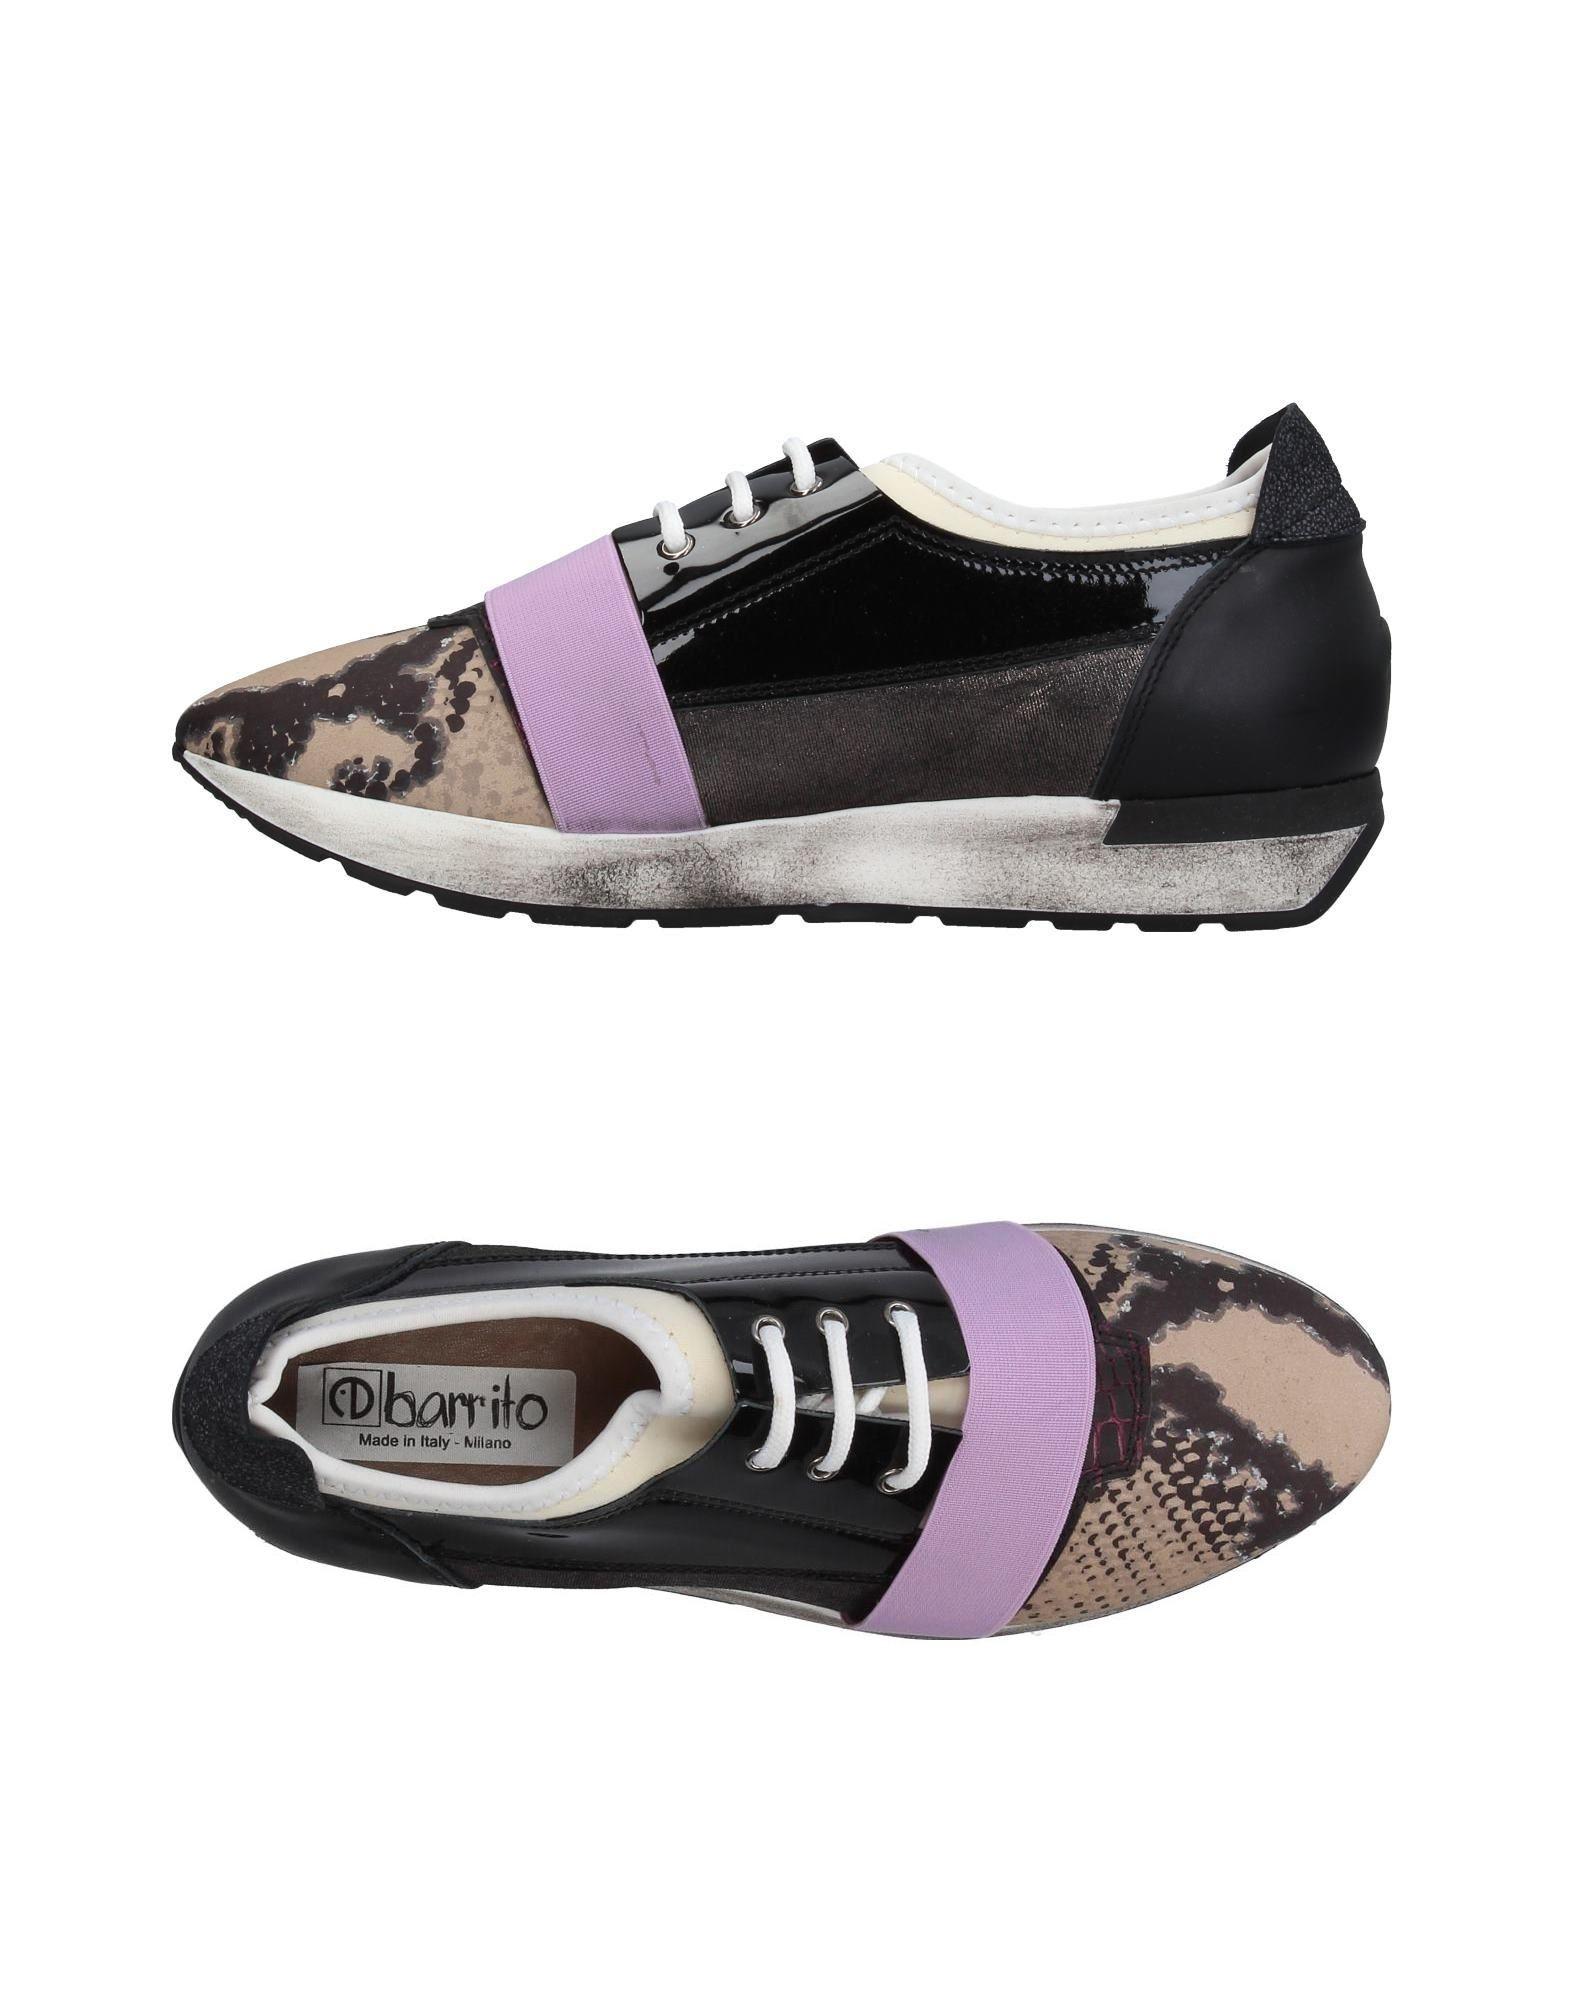 Ebarrito Sneakers Damen  11396363FB Gute Qualität beliebte Schuhe